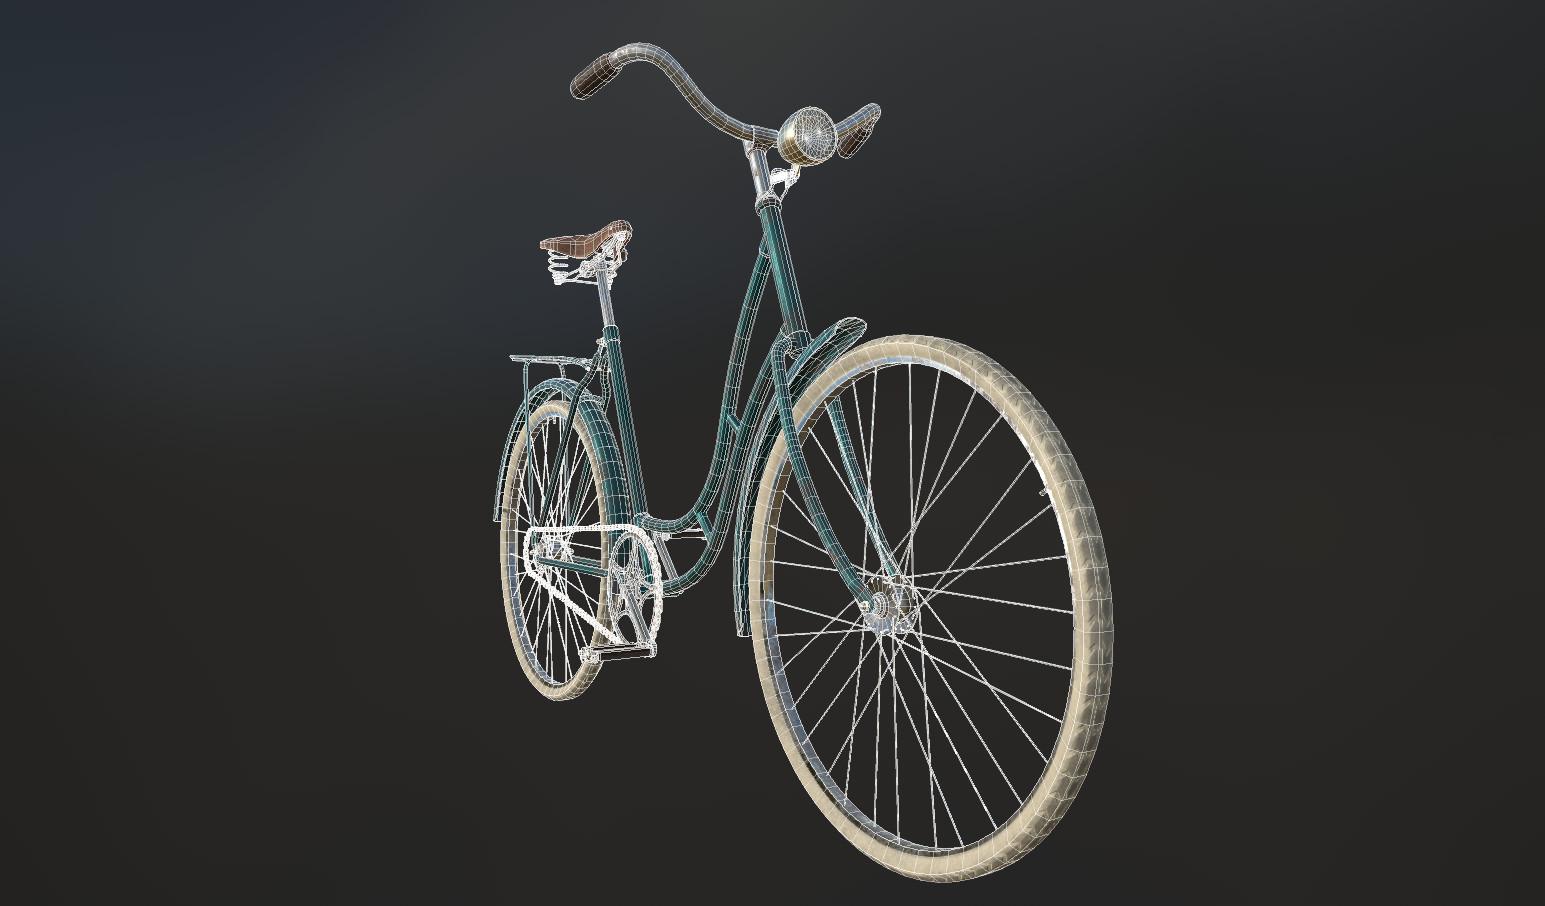 Litha bacchi bike08